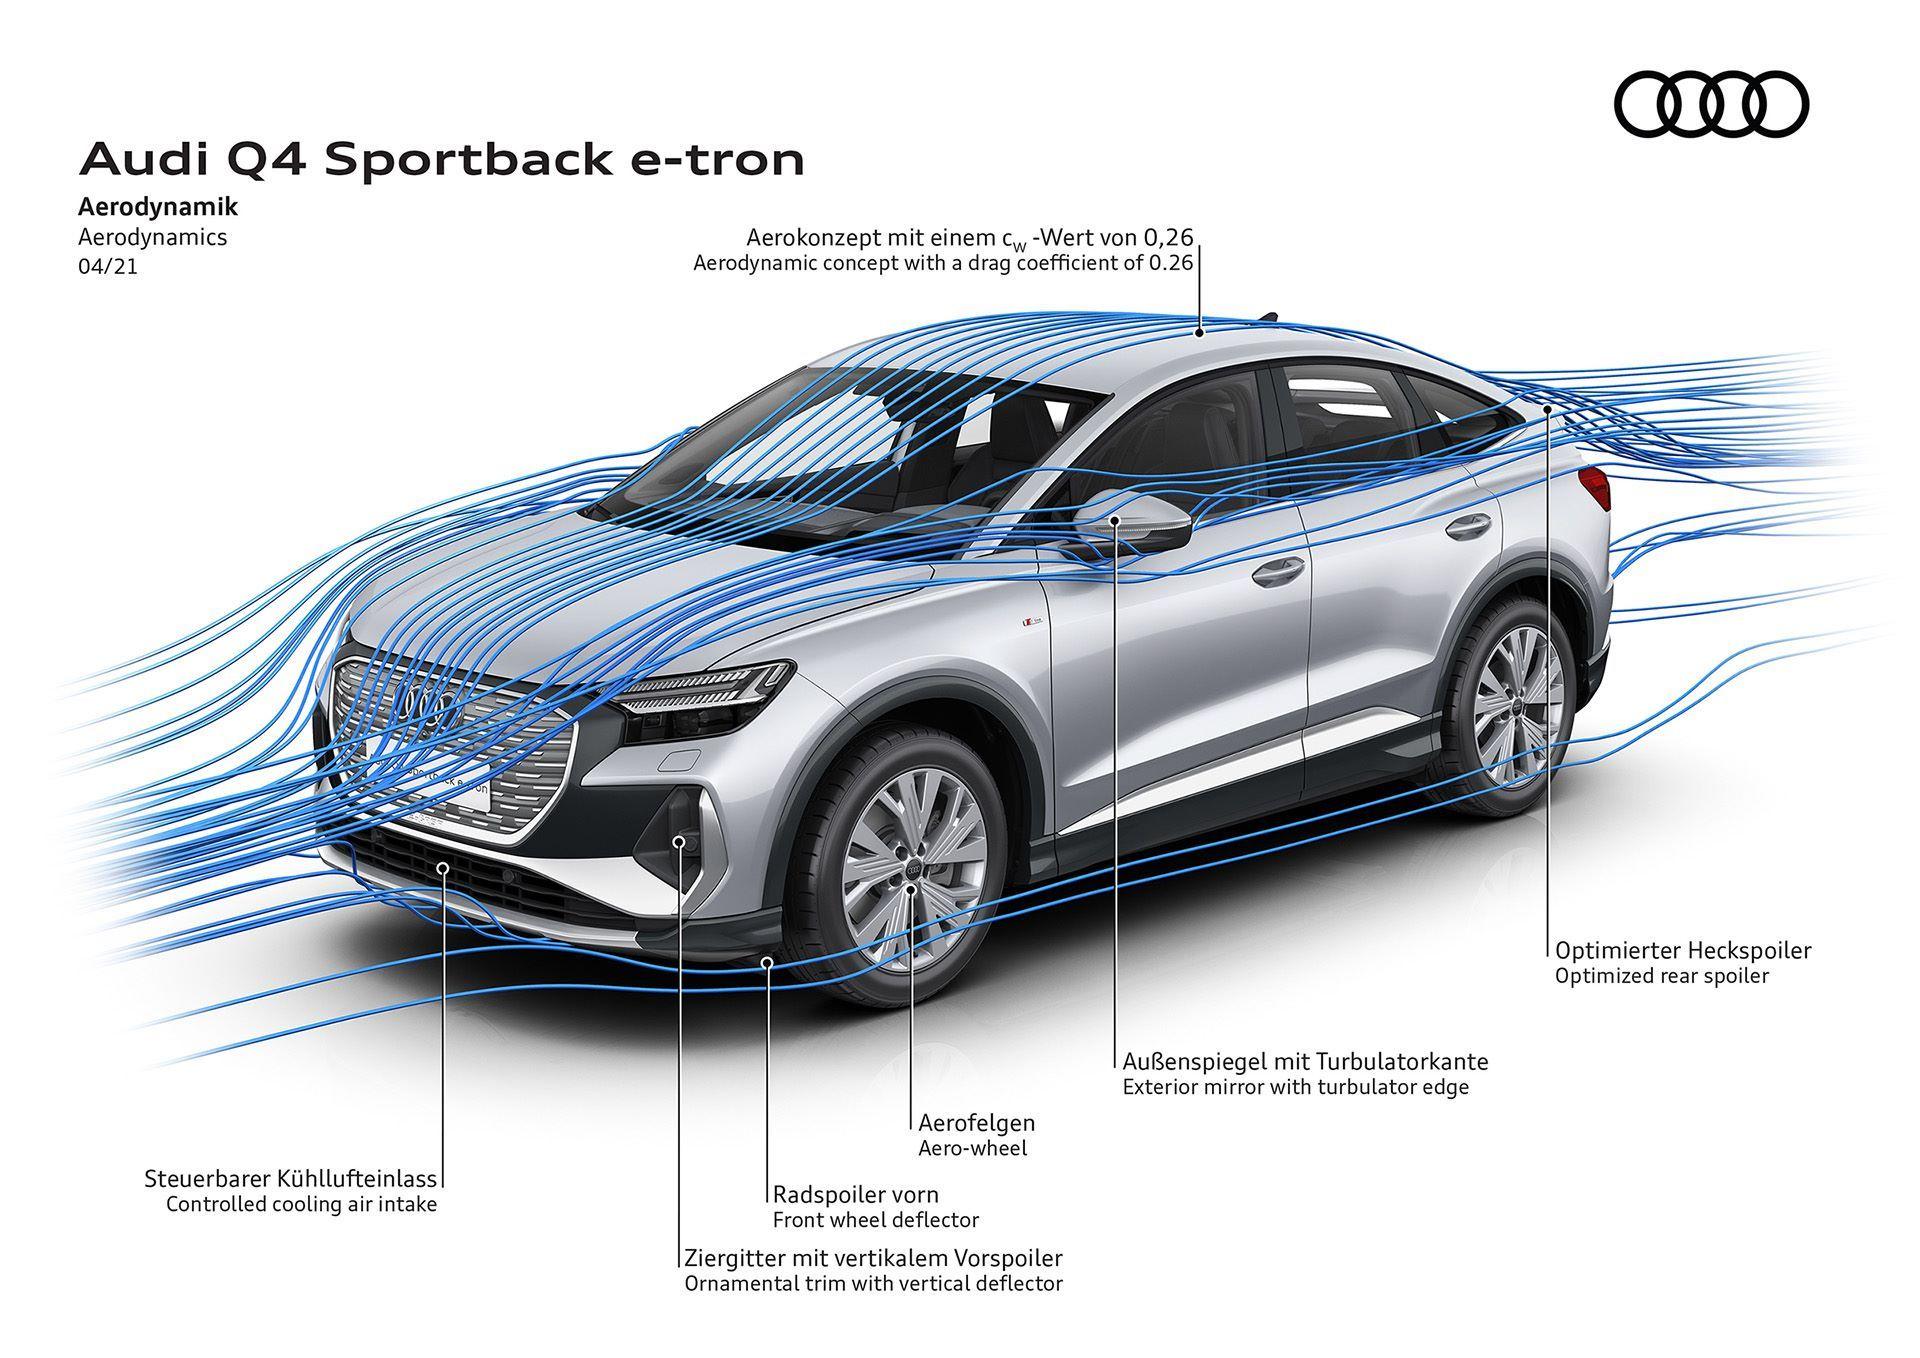 Audi-Q4-e-tron-and-Q4-e-tron-Sportback-173